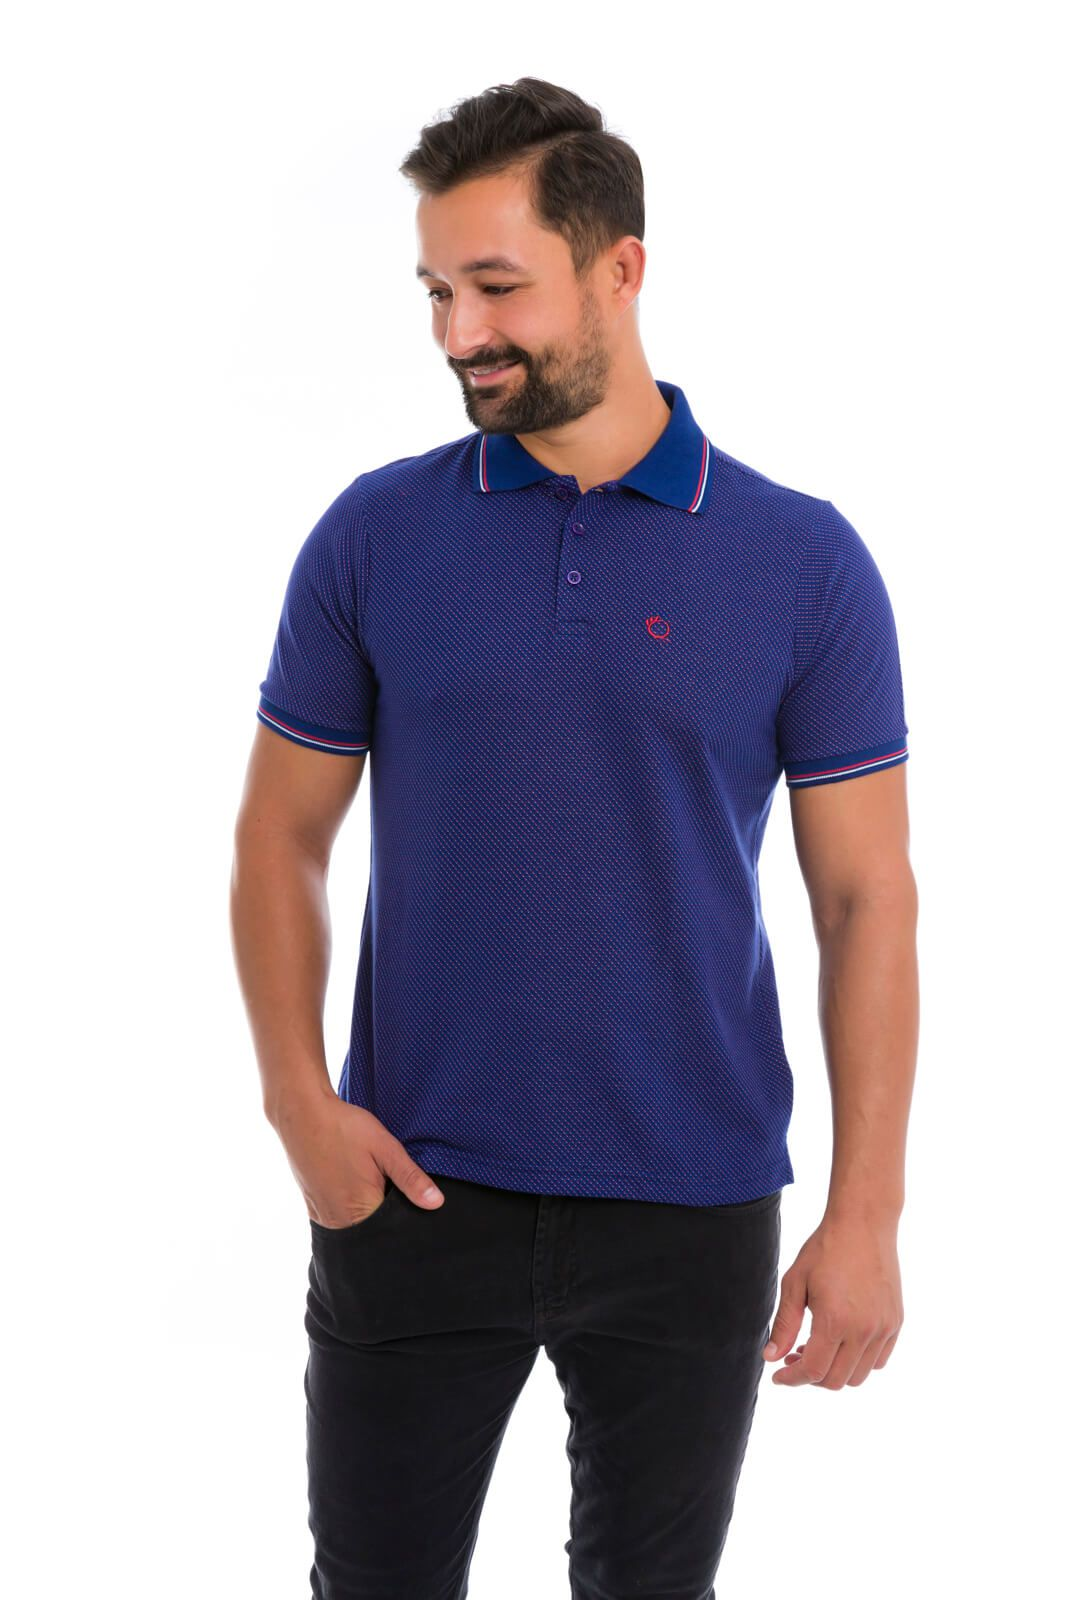 KIT Camisa Gola Polo Olimpo Slim Malha Jaqguard 3 Cores